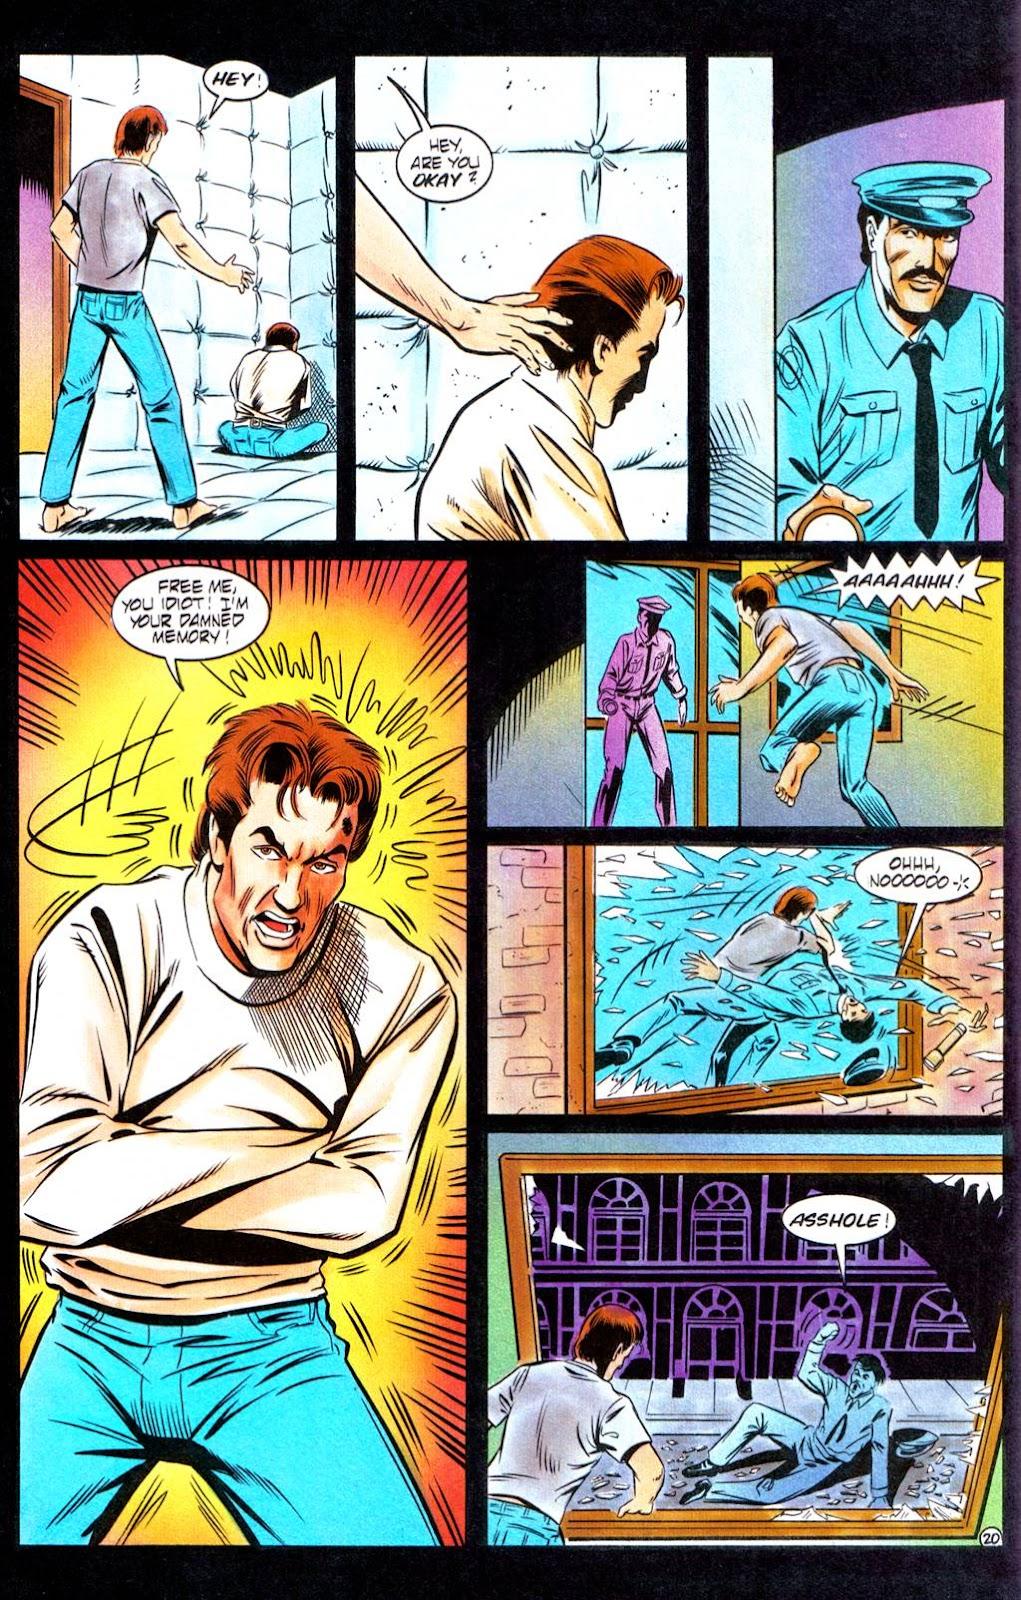 Read online Freddy's Dead: The Final Nightmare comic -  Issue #1 - 24